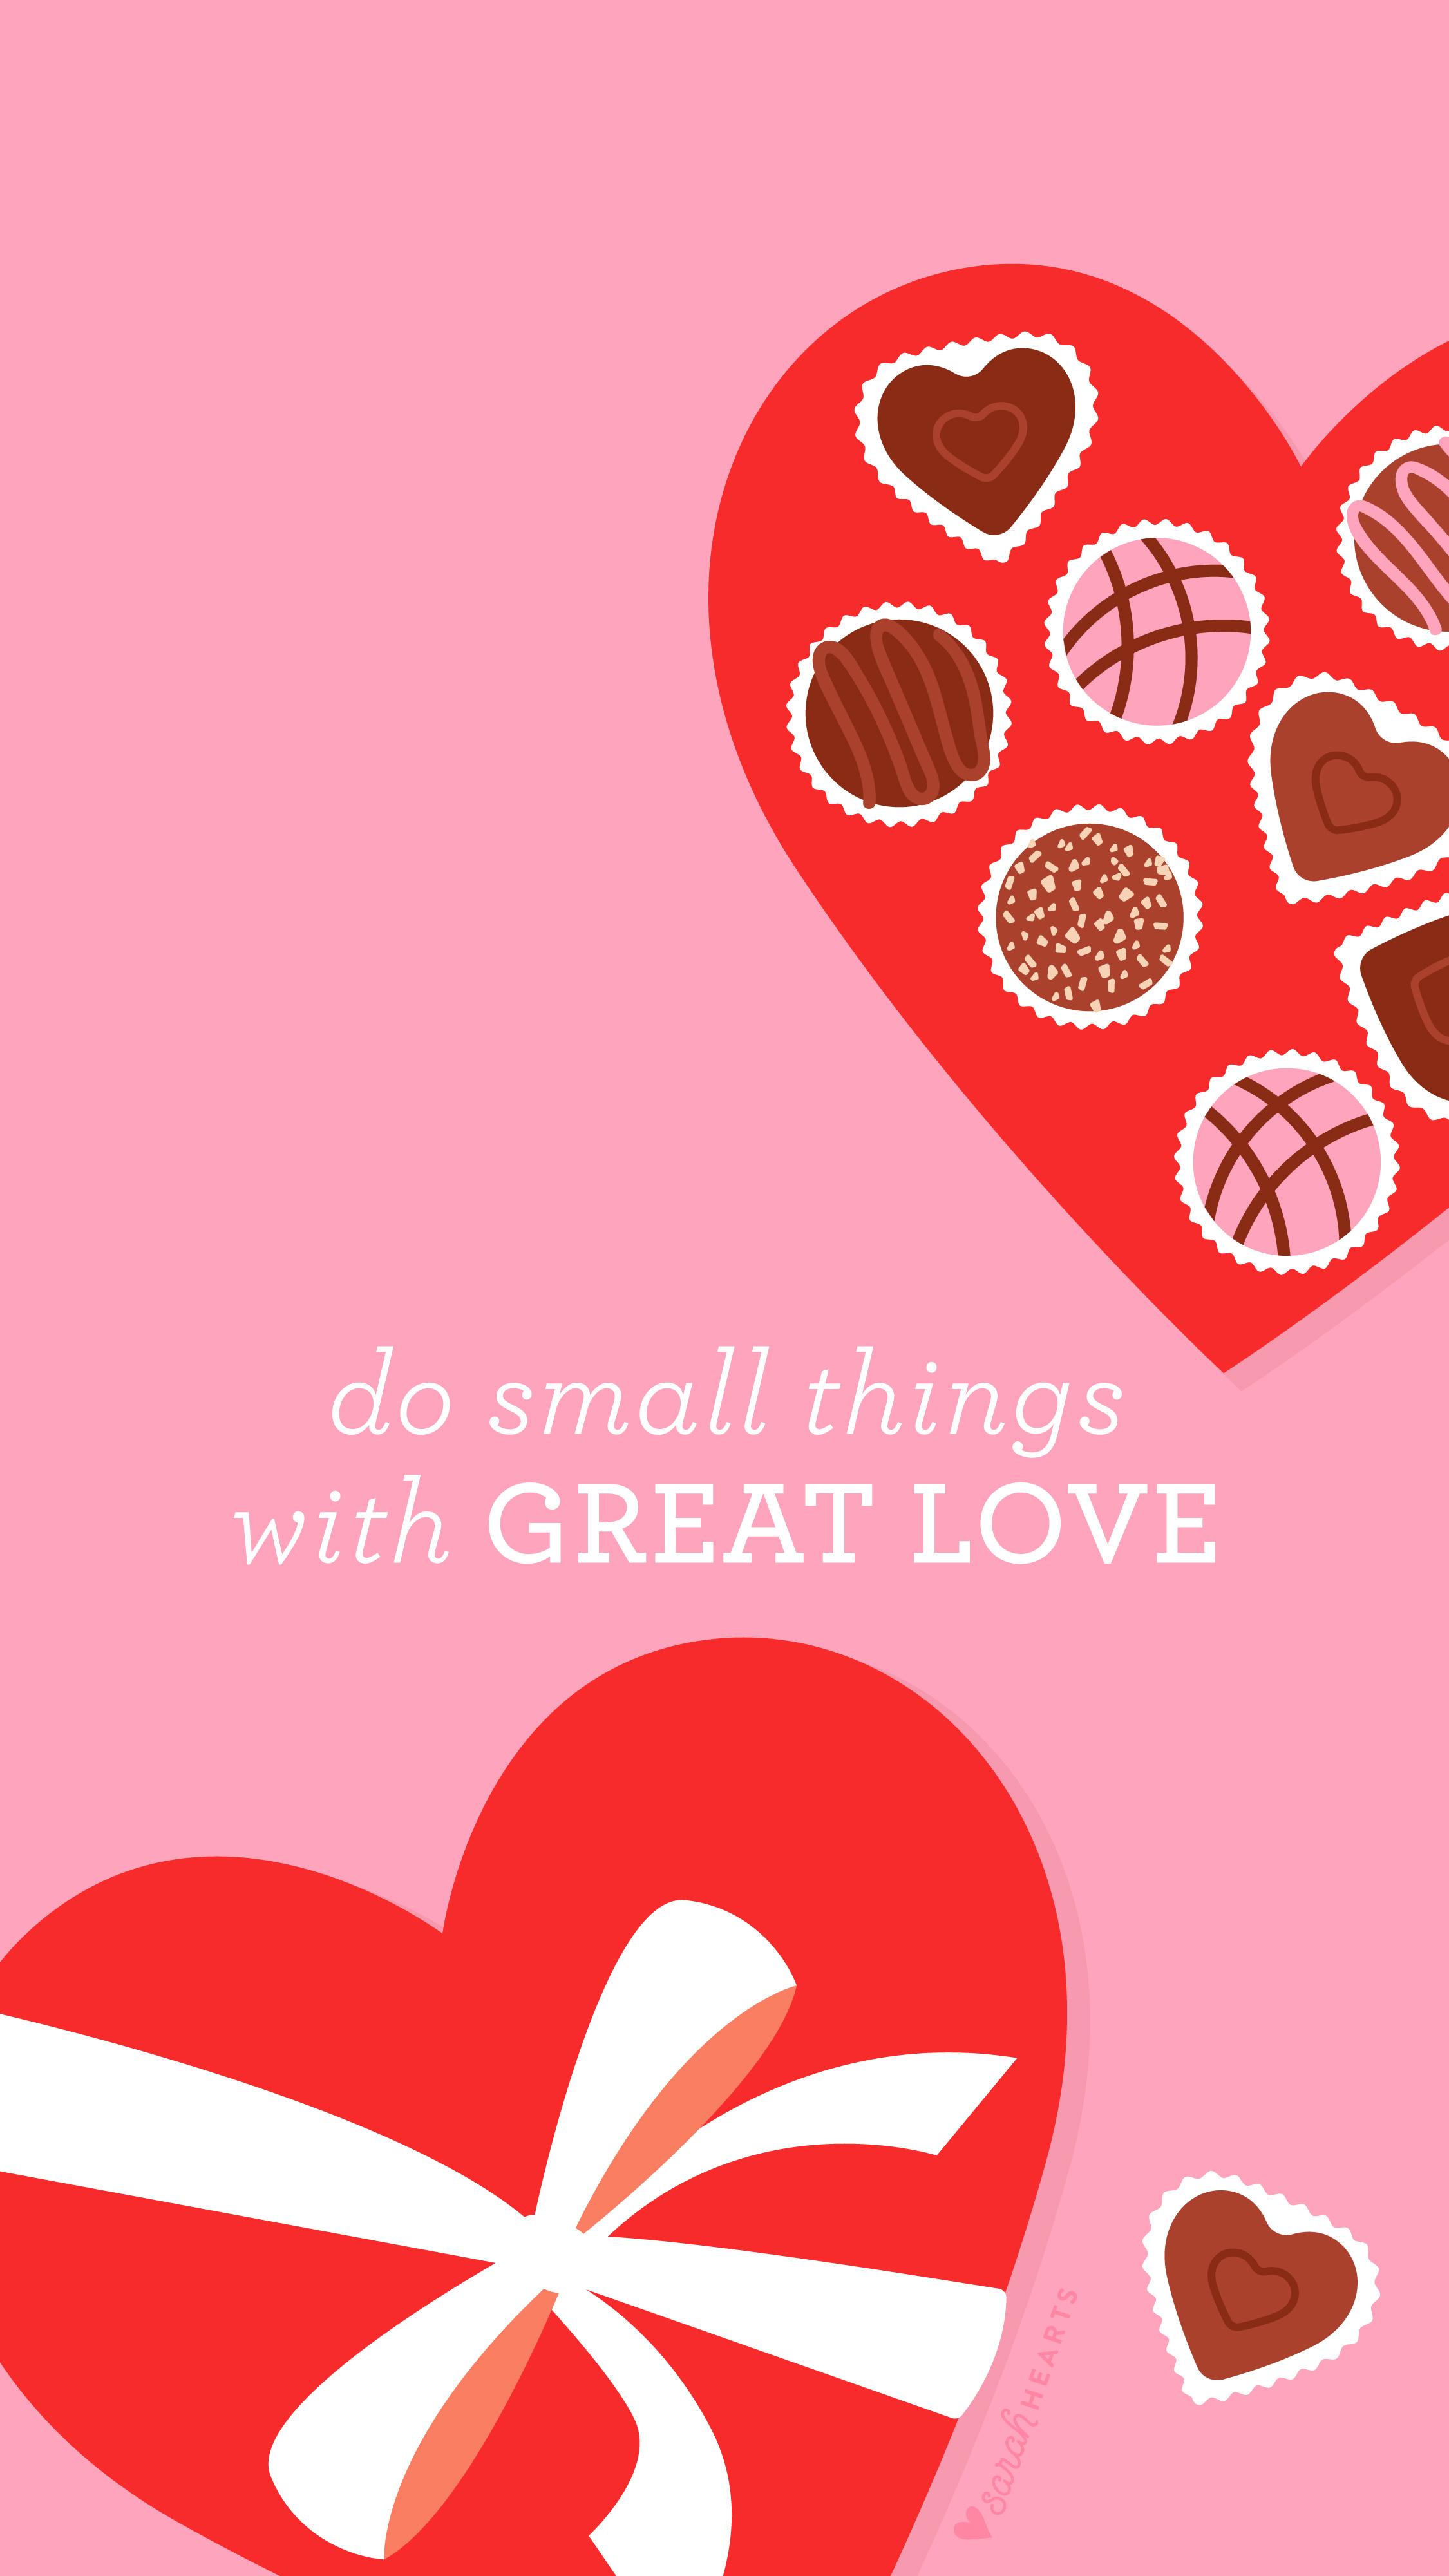 Graphic Designer Quote Wallpaper Valentines February 2017 Calendar Wallpaper Sarah Hearts